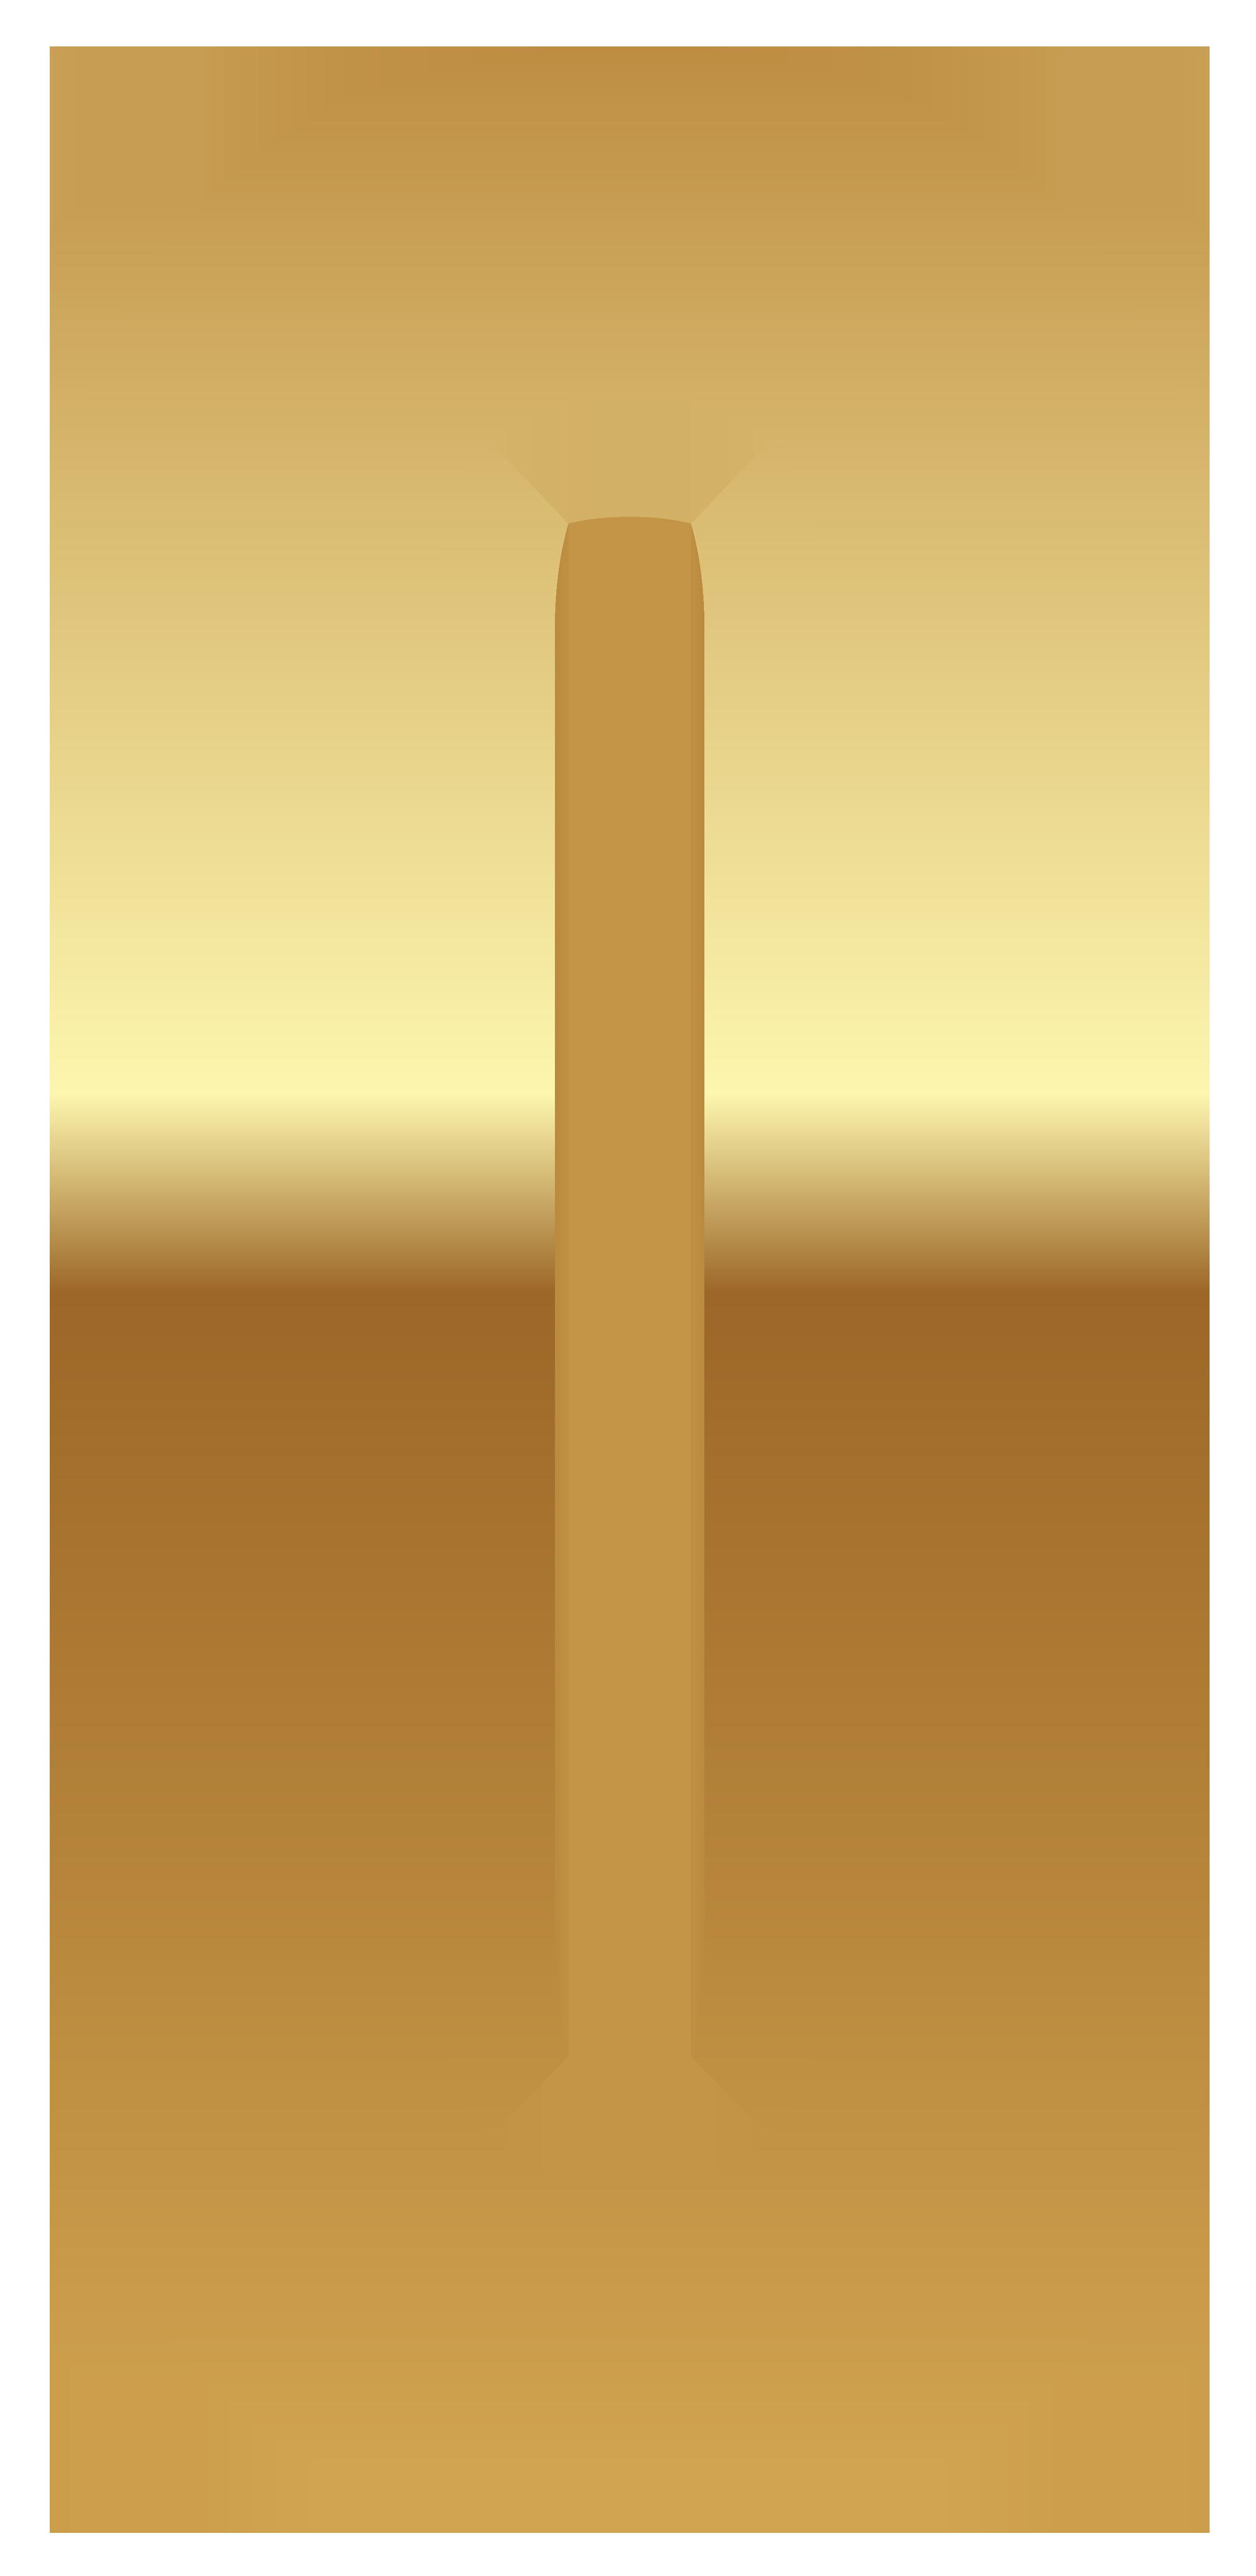 Grains clipart golden wheat. Number zero png image